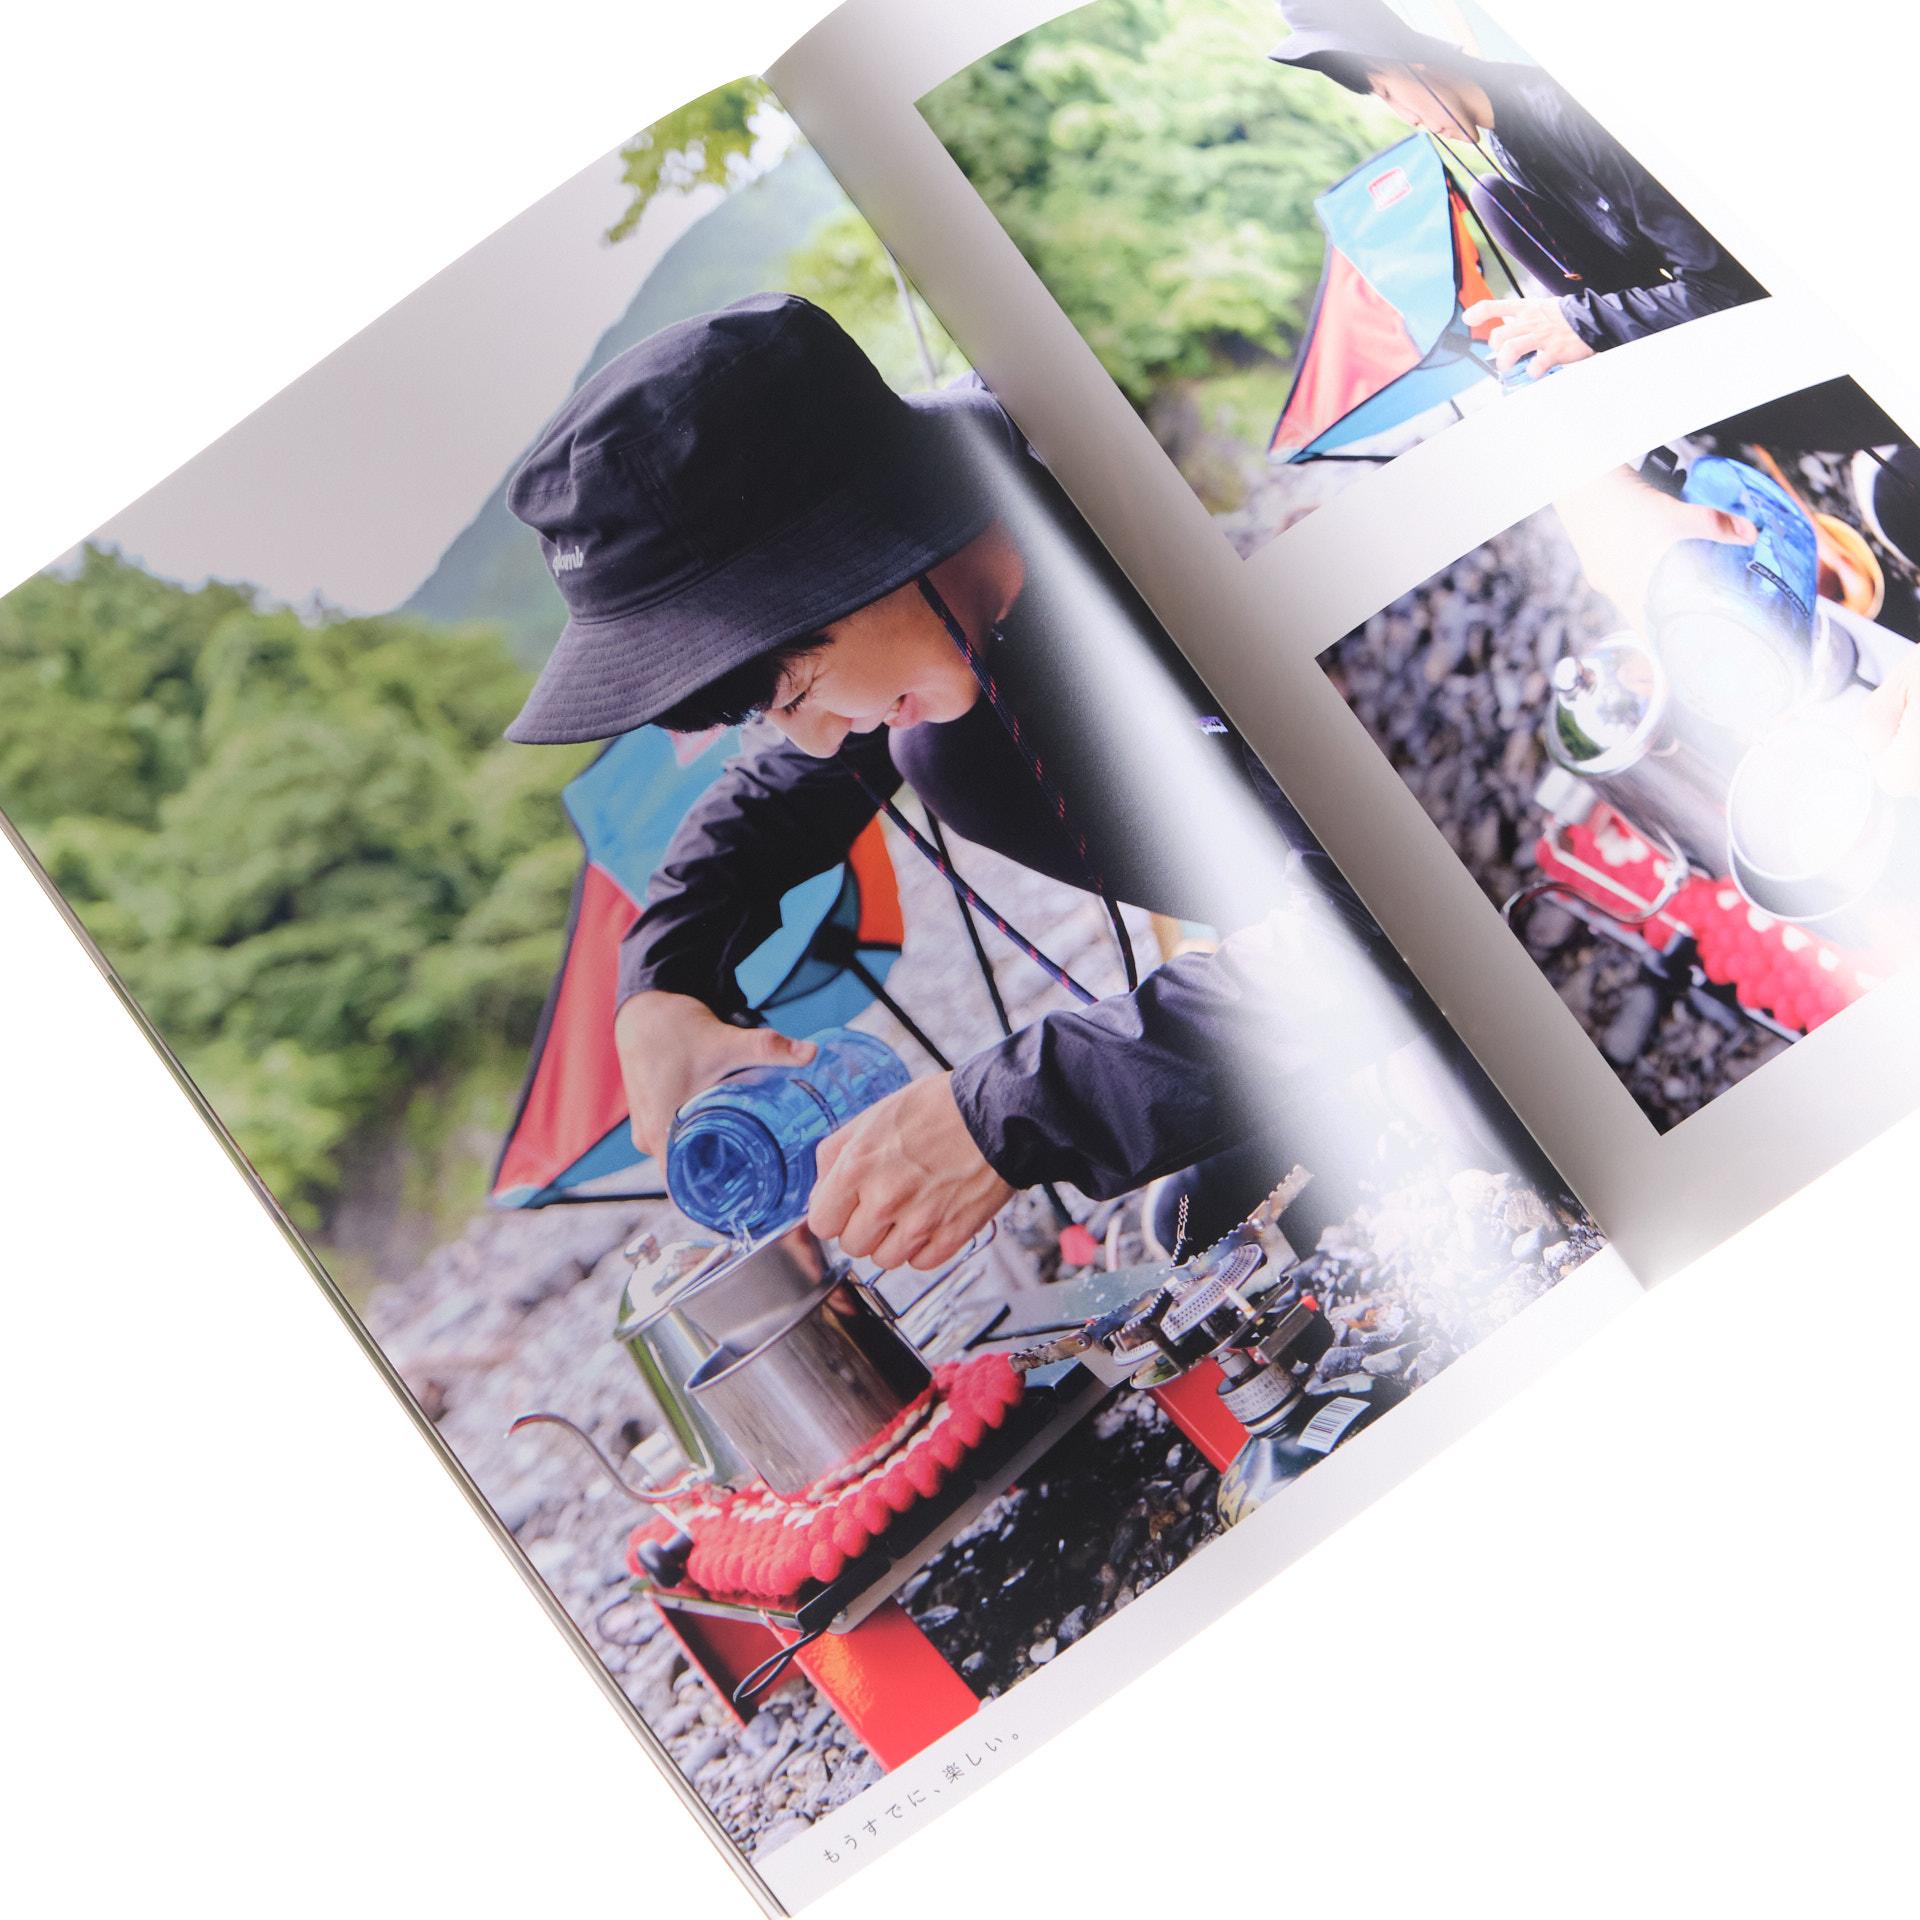 2020.10.23 DC夕霧コラボ・チェーン・葵ソログッズ5917.jpg